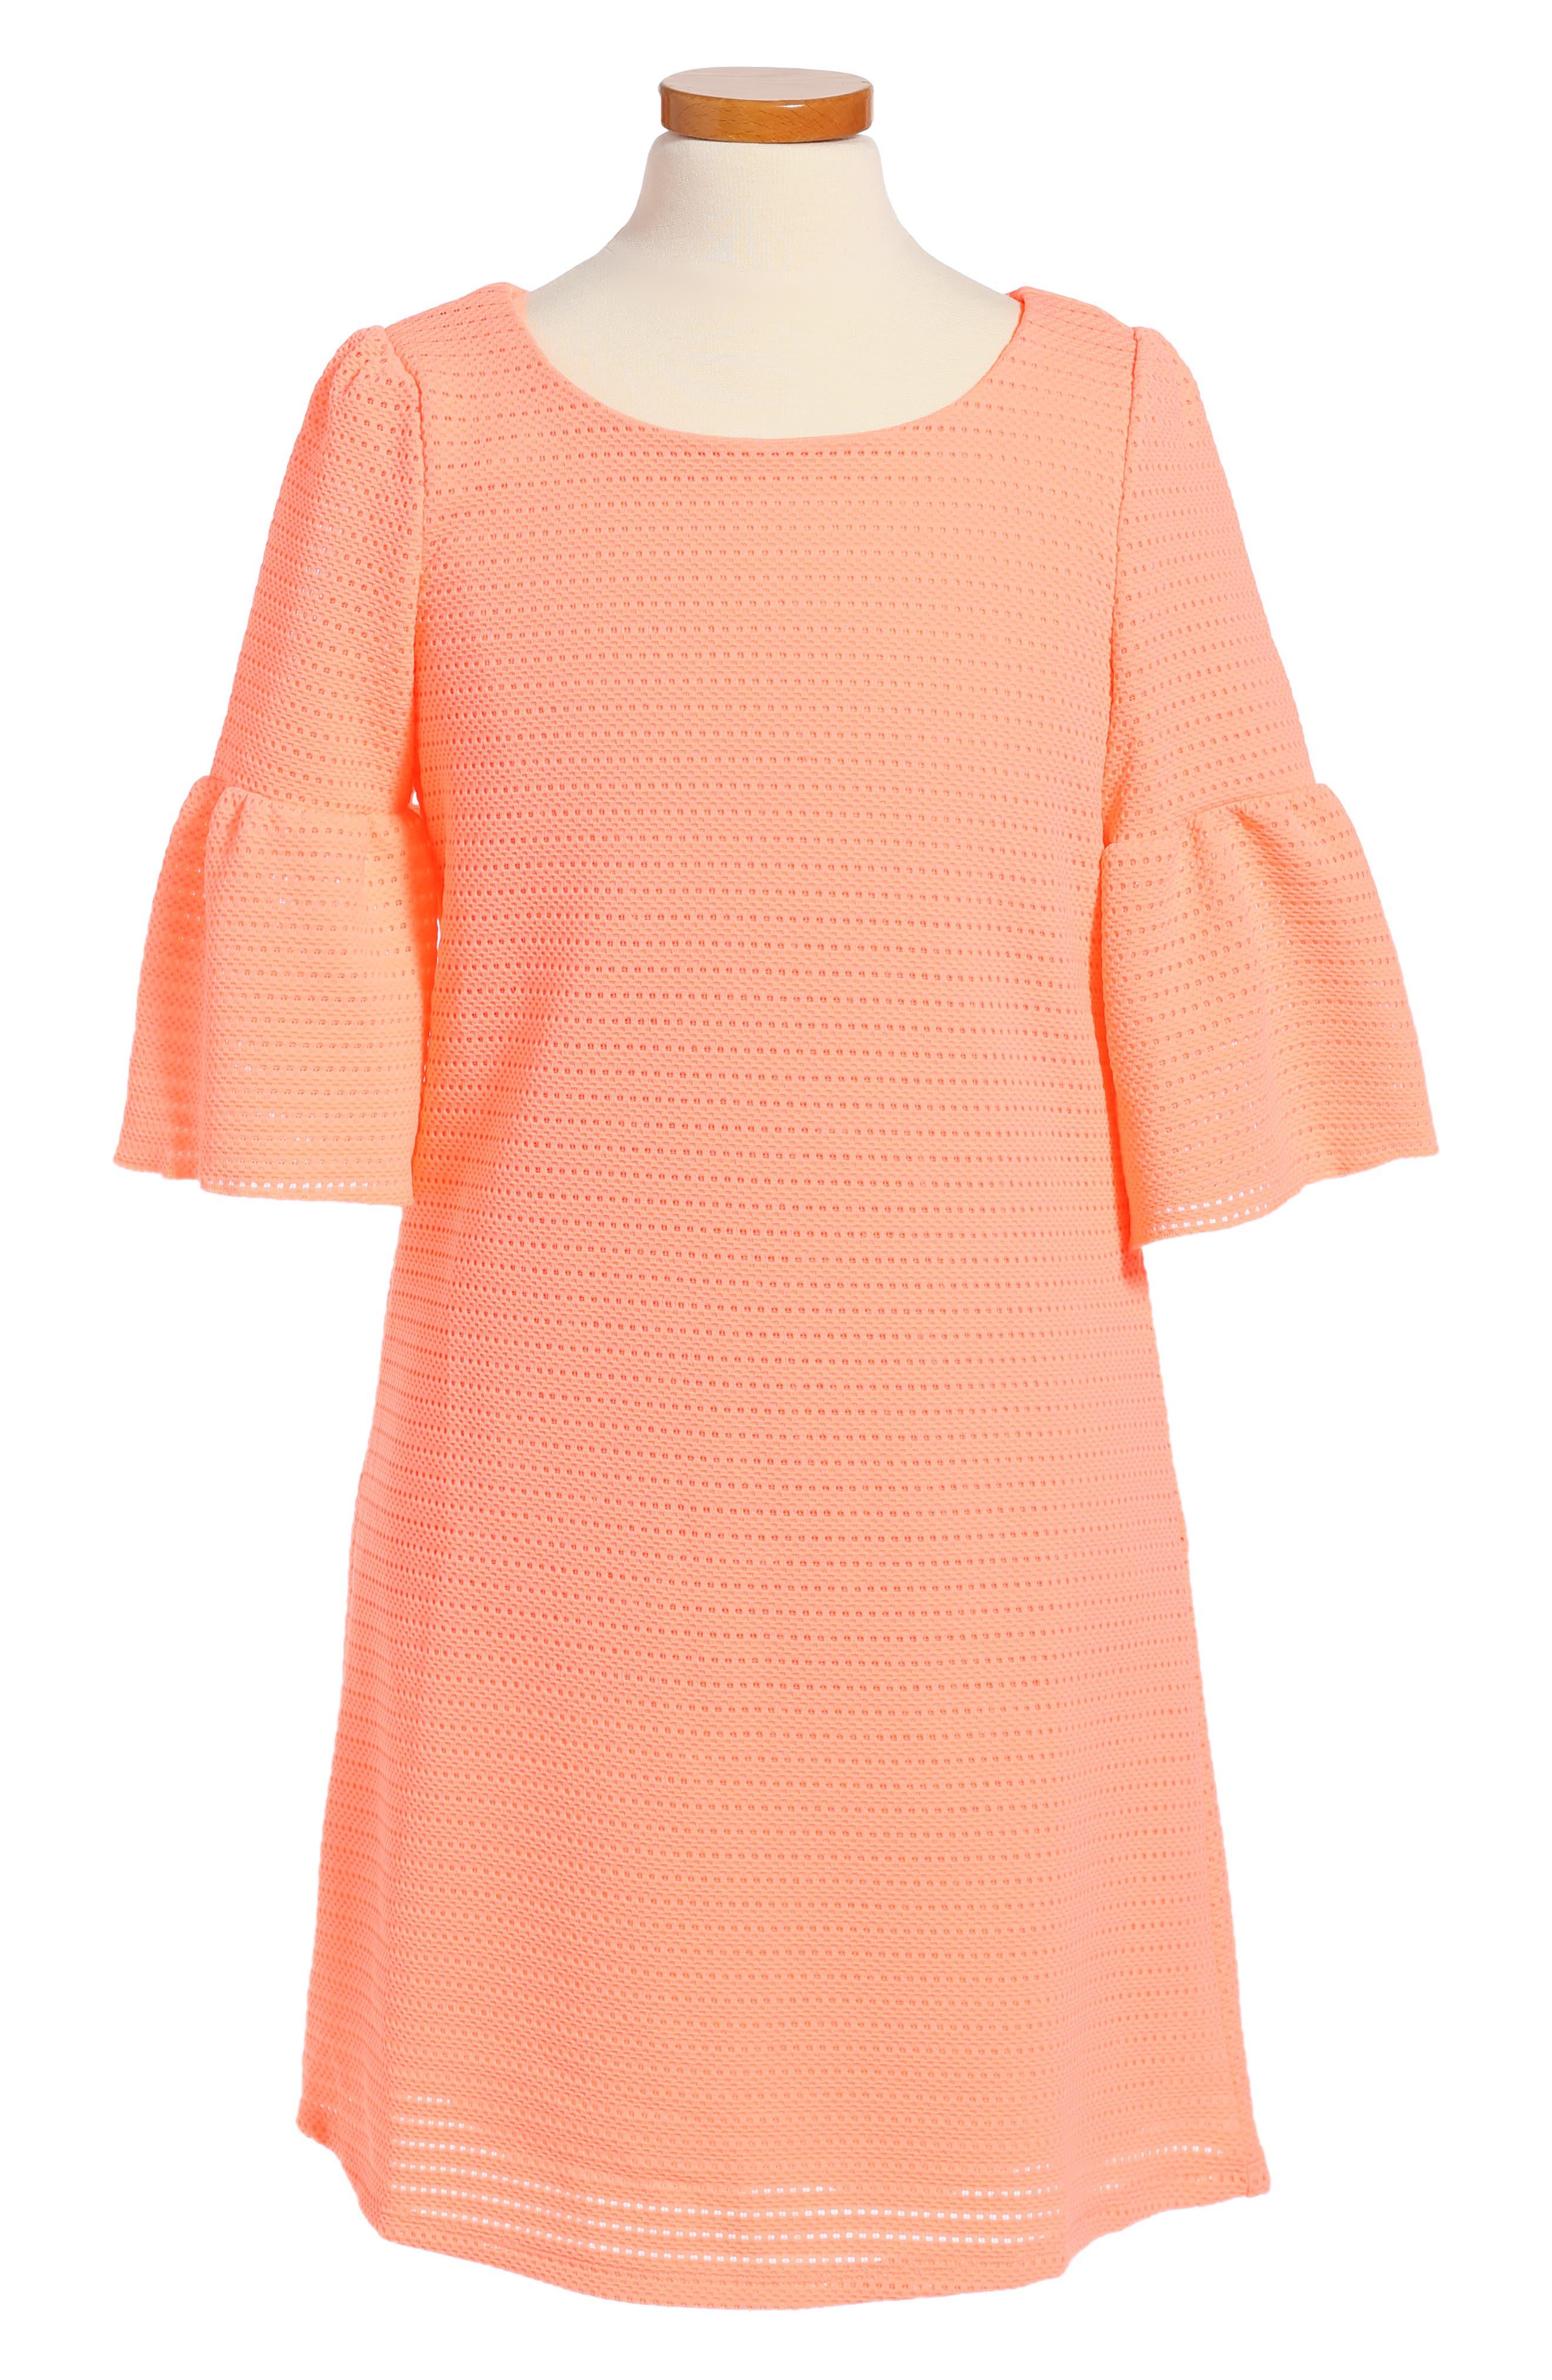 Bell Sleeve Dress,                             Main thumbnail 1, color,                             950